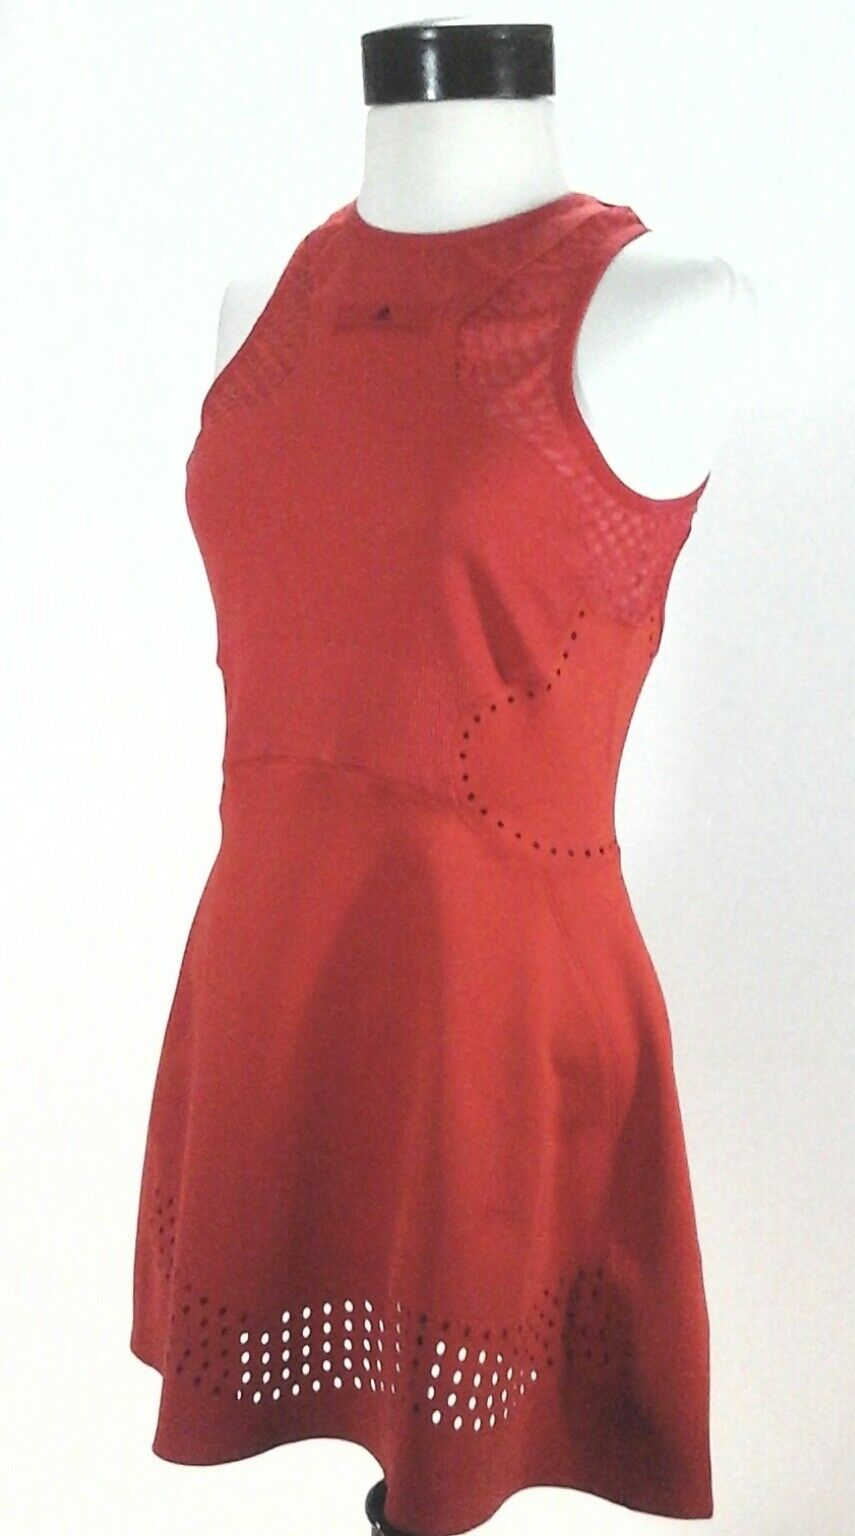 Adidas STELLA MCCARTNEY Tennis Dress Q3 Barricade orange CY1905 Women's  130 New